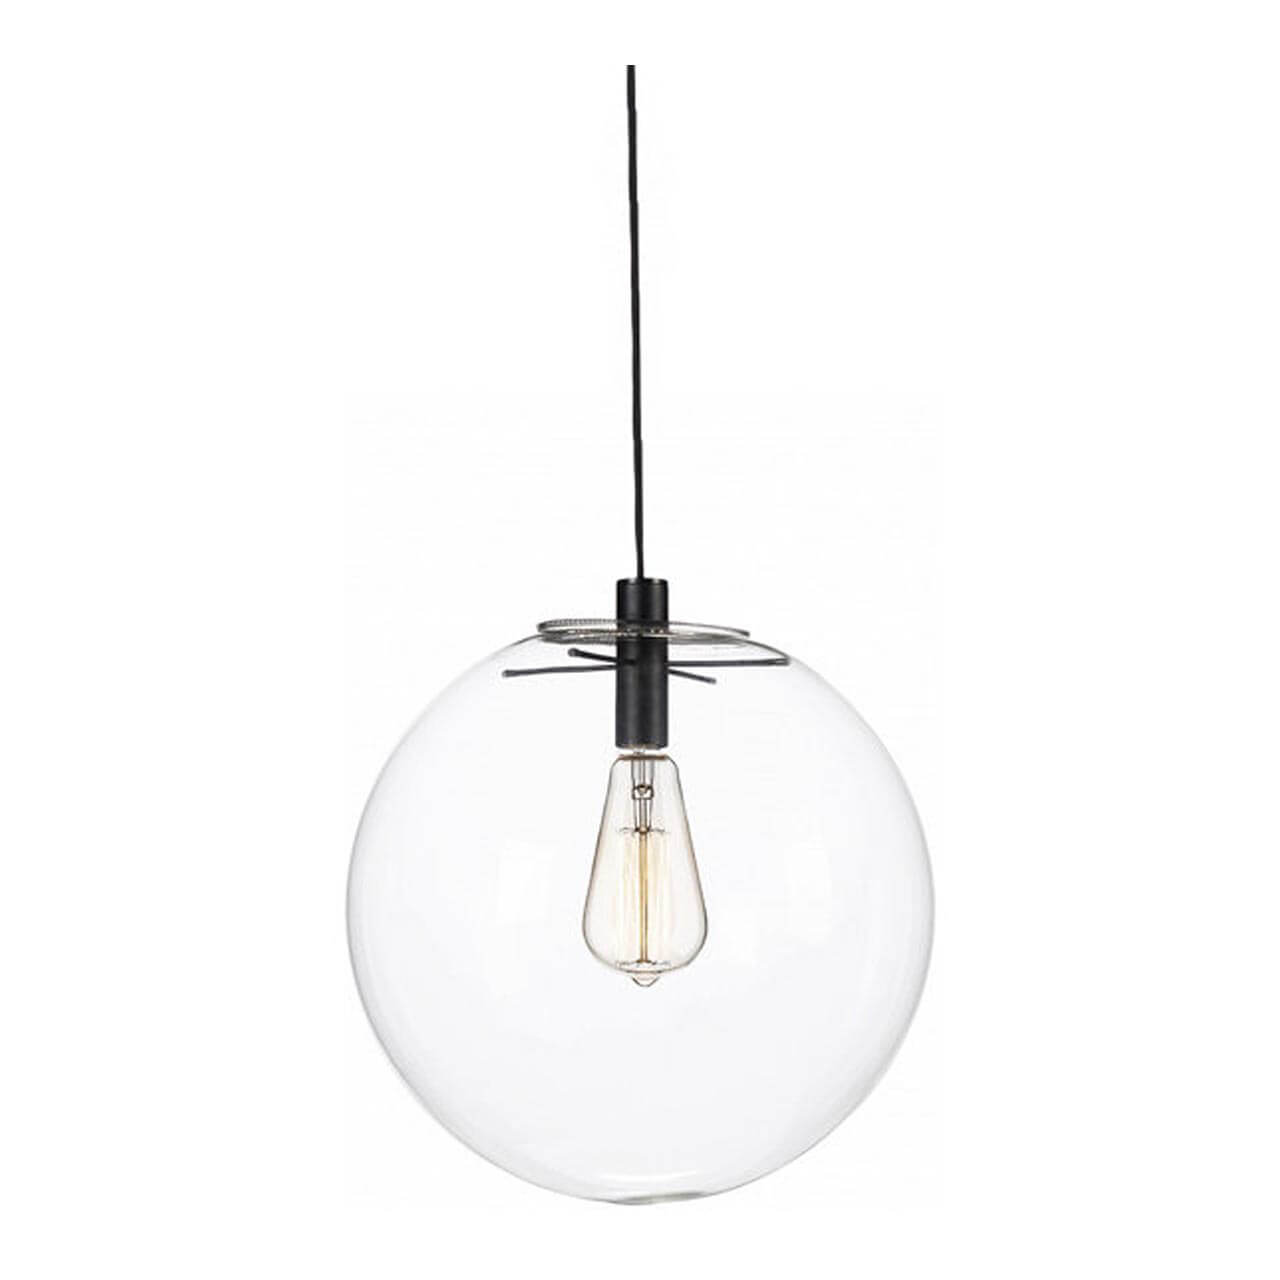 цена на Светильник Kink Light 07562-20,21 Меркурий